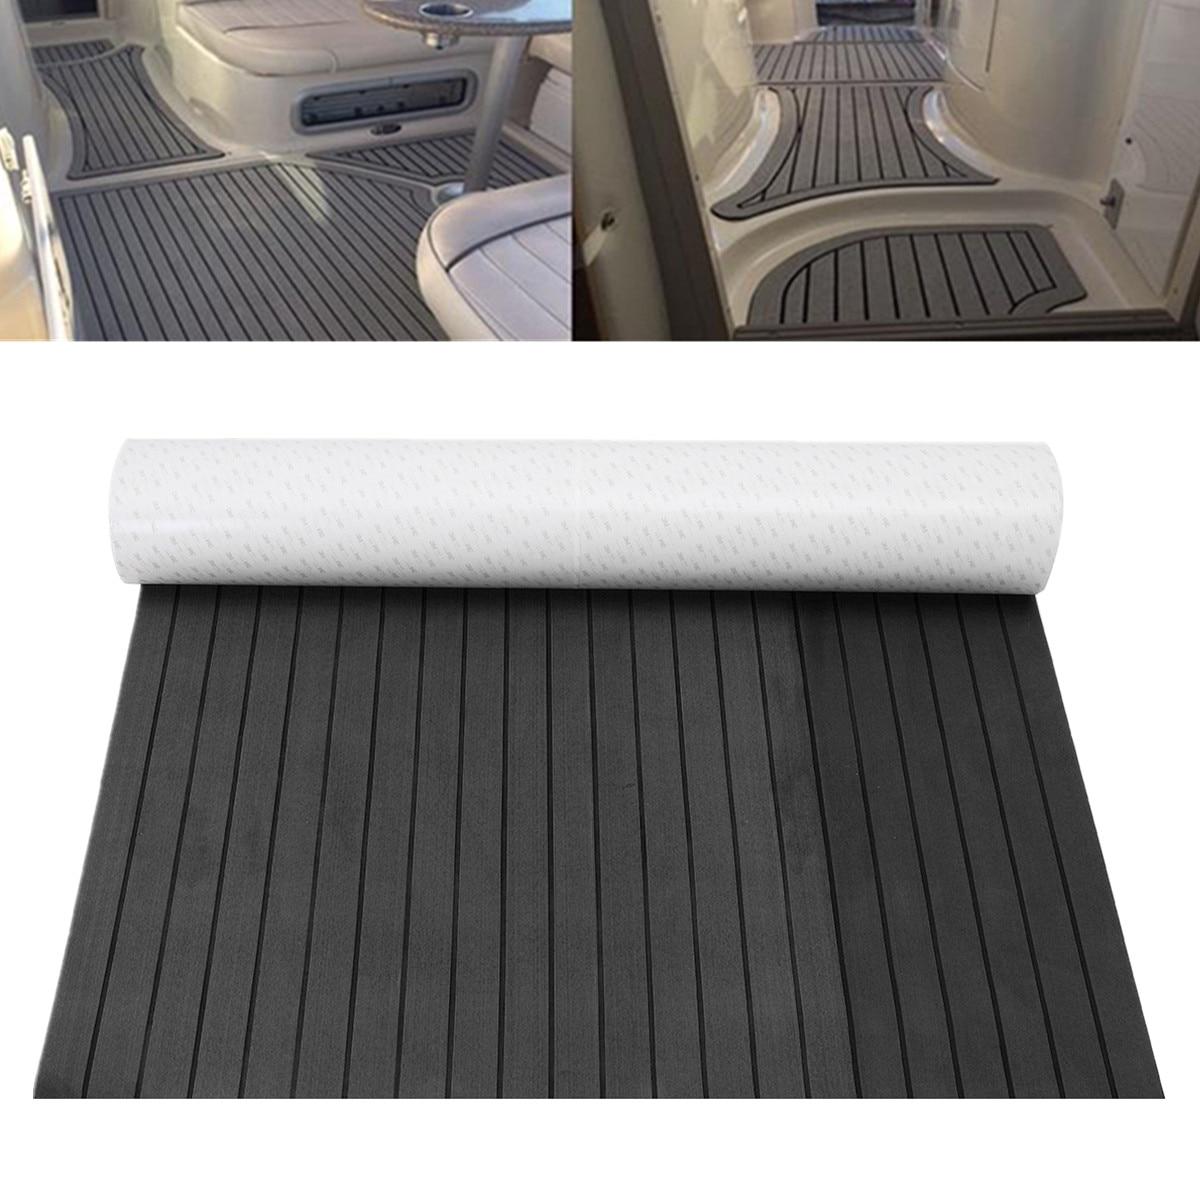 1200mmx2400mmx5mm Self-Adhesive Foam Teak Decking EVA Foam Marine Flooring Faux Boat Decking Sheet Accessories Marine Dark Grey1200mmx2400mmx5mm Self-Adhesive Foam Teak Decking EVA Foam Marine Flooring Faux Boat Decking Sheet Accessories Marine Dark Grey